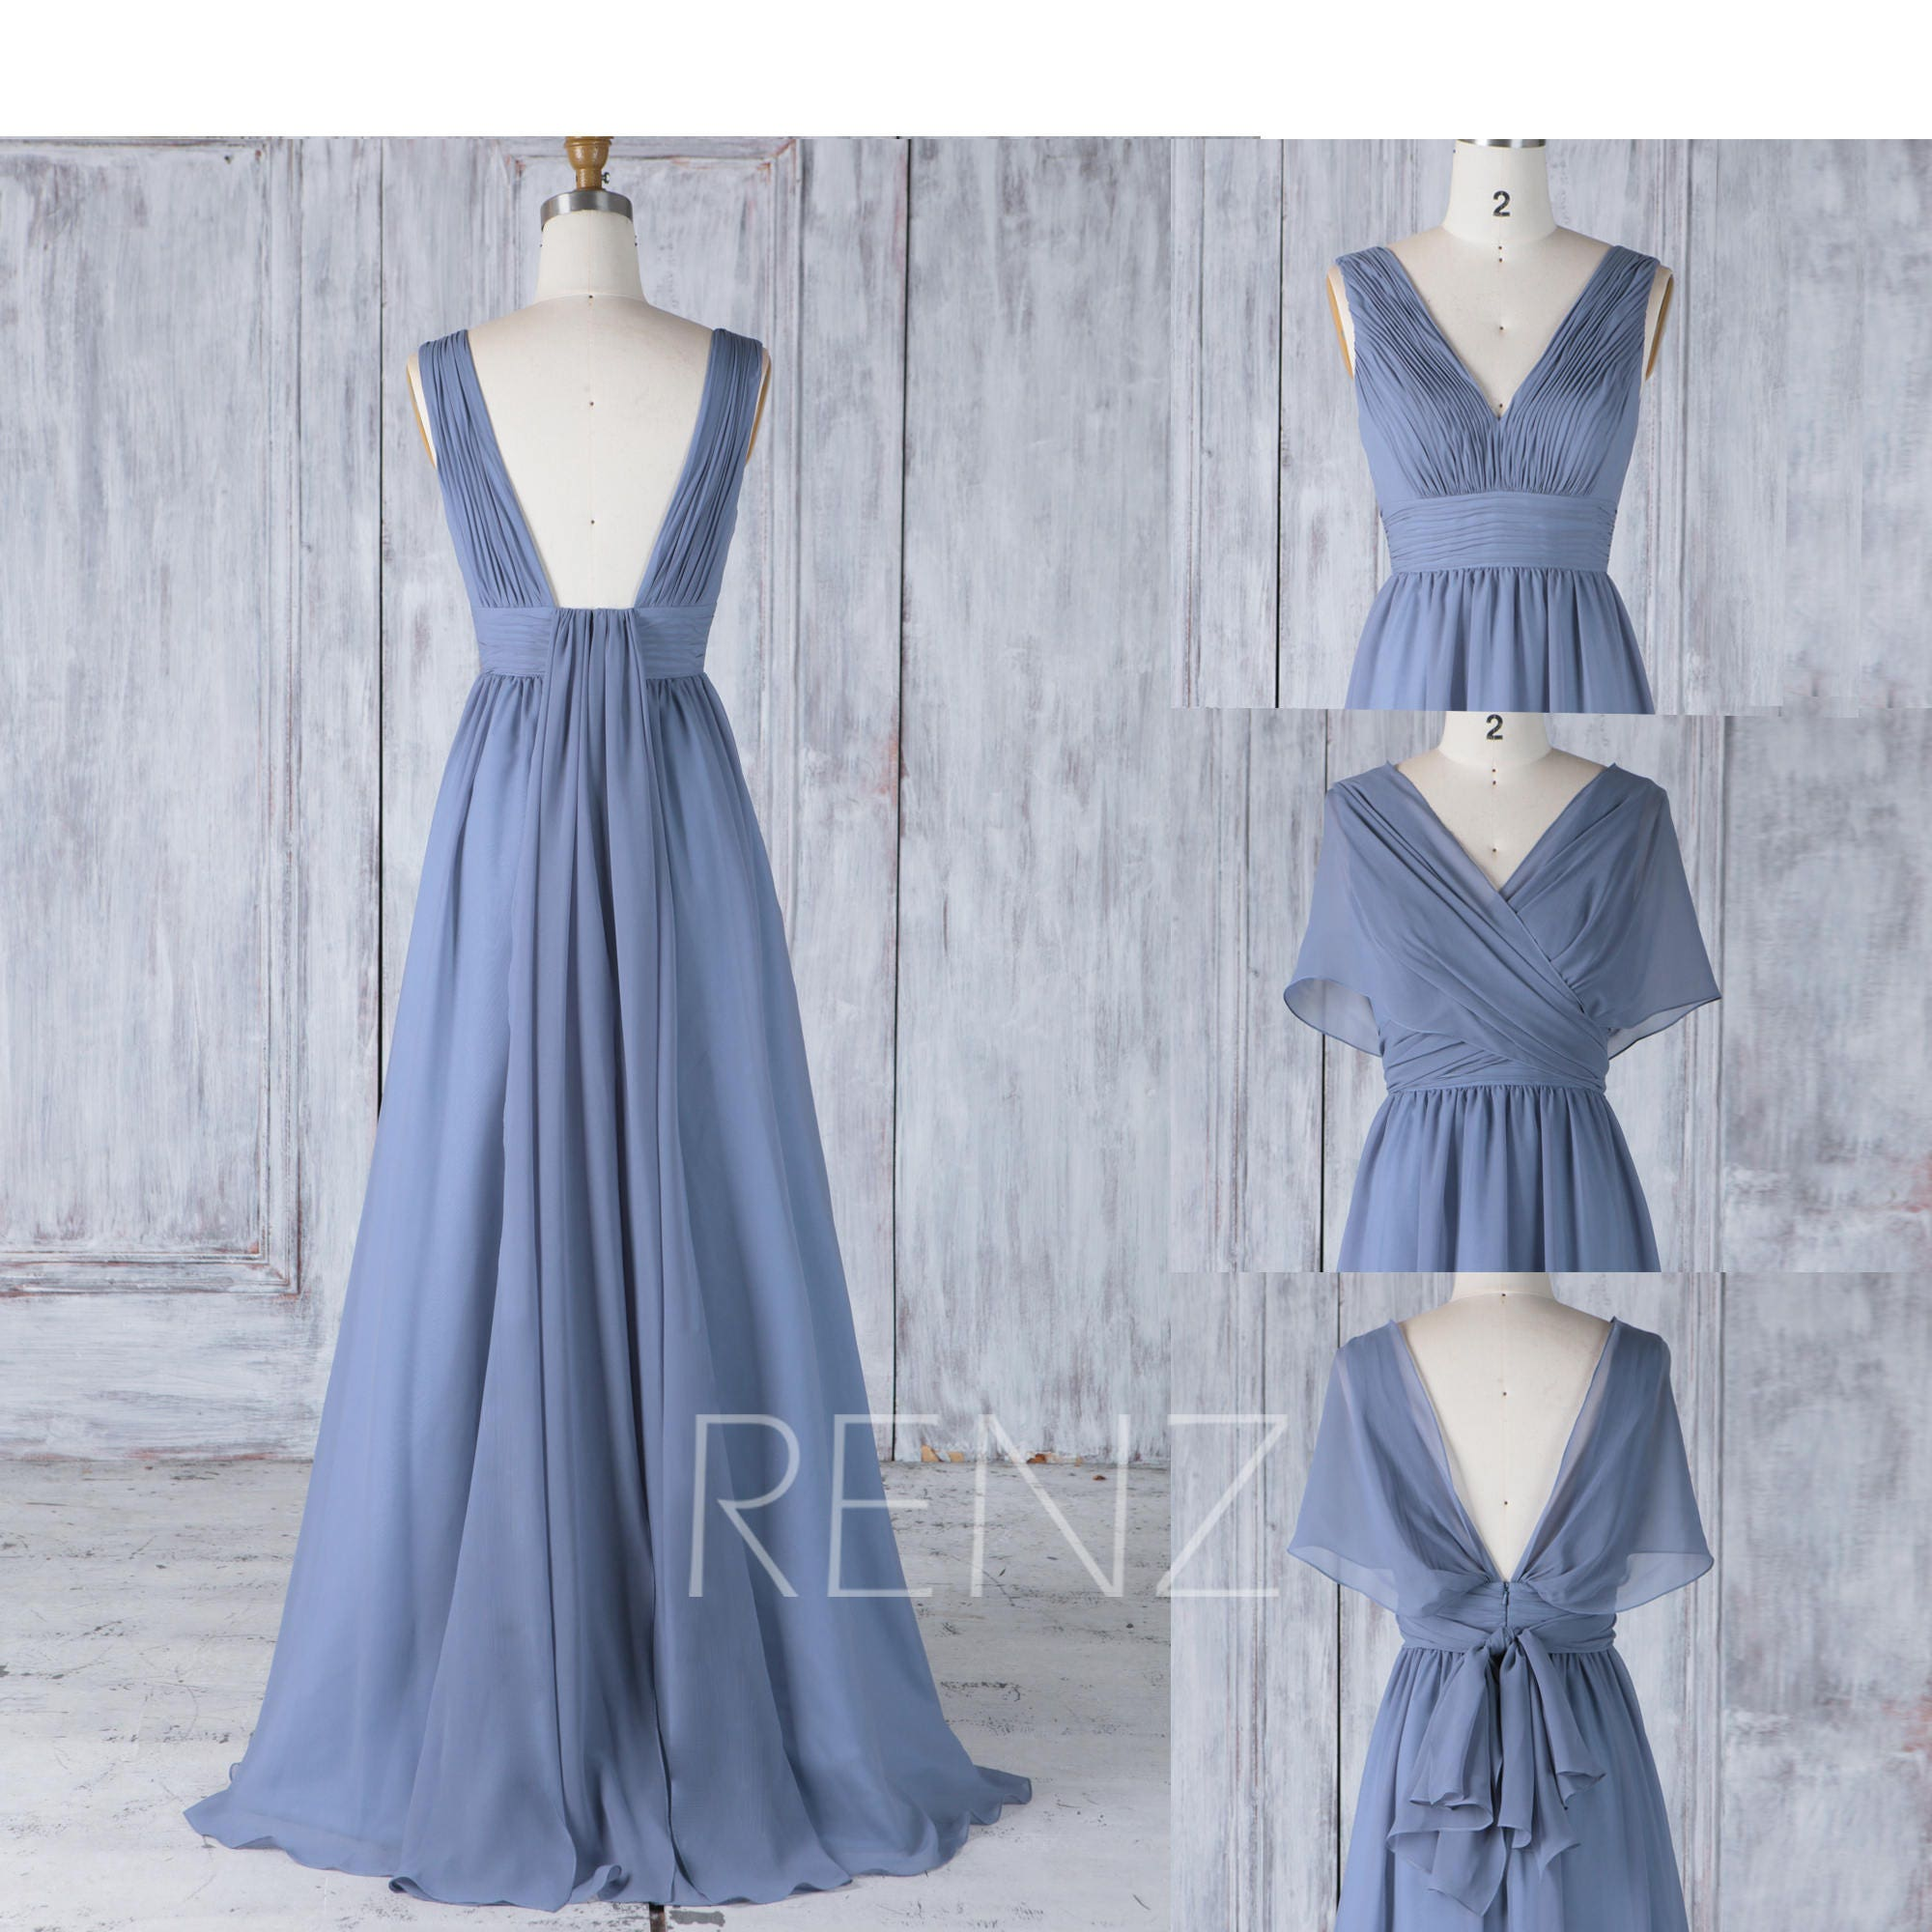 Bridesmaid Dress Steel Blue Chiffon Wedding DressConvertible